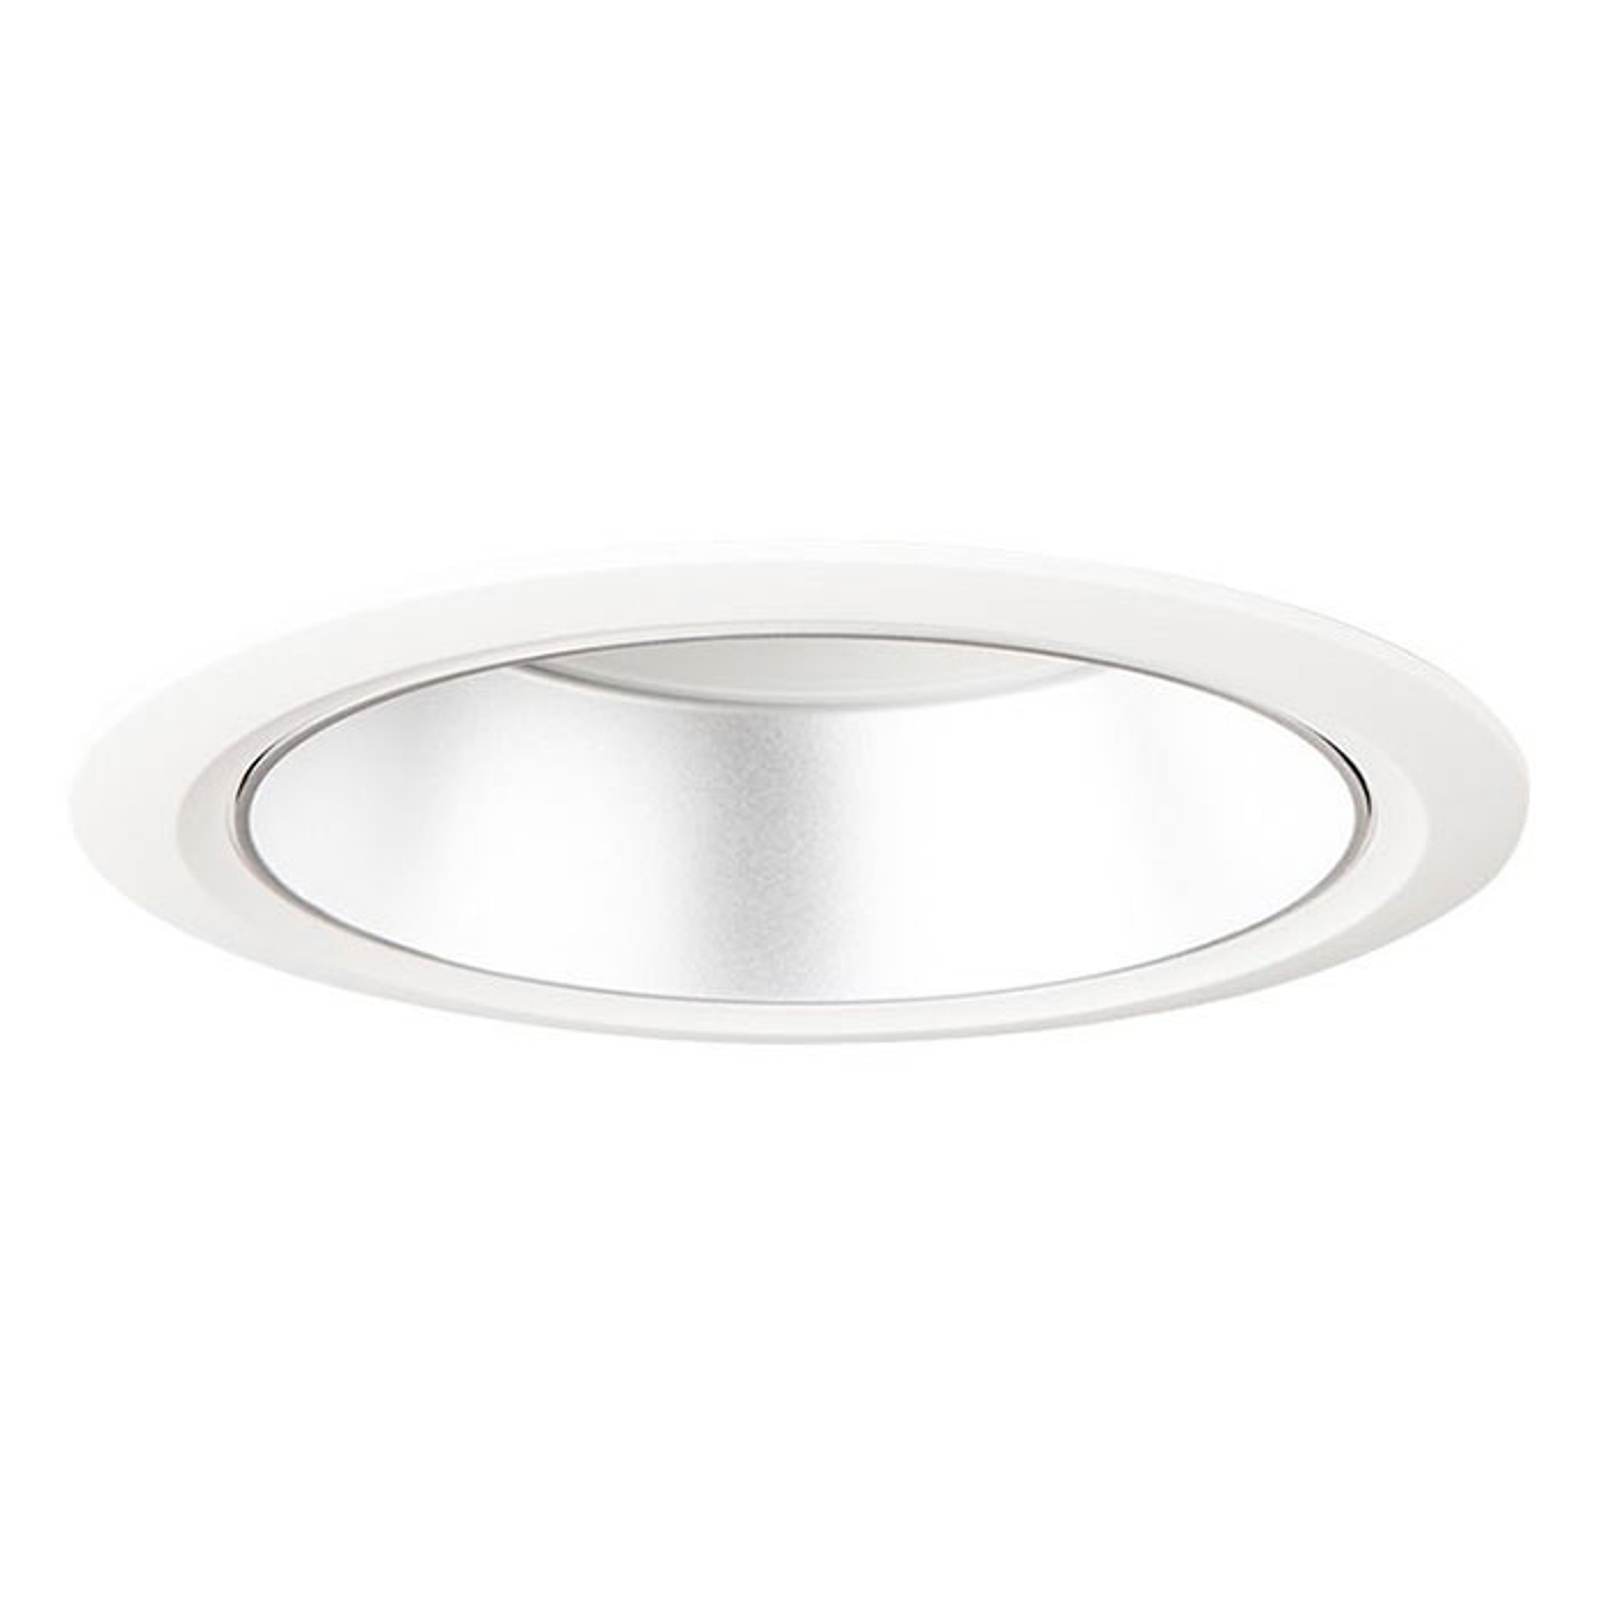 LED-Downlight D70-RF155 HF 4.000K weiß/silber matt